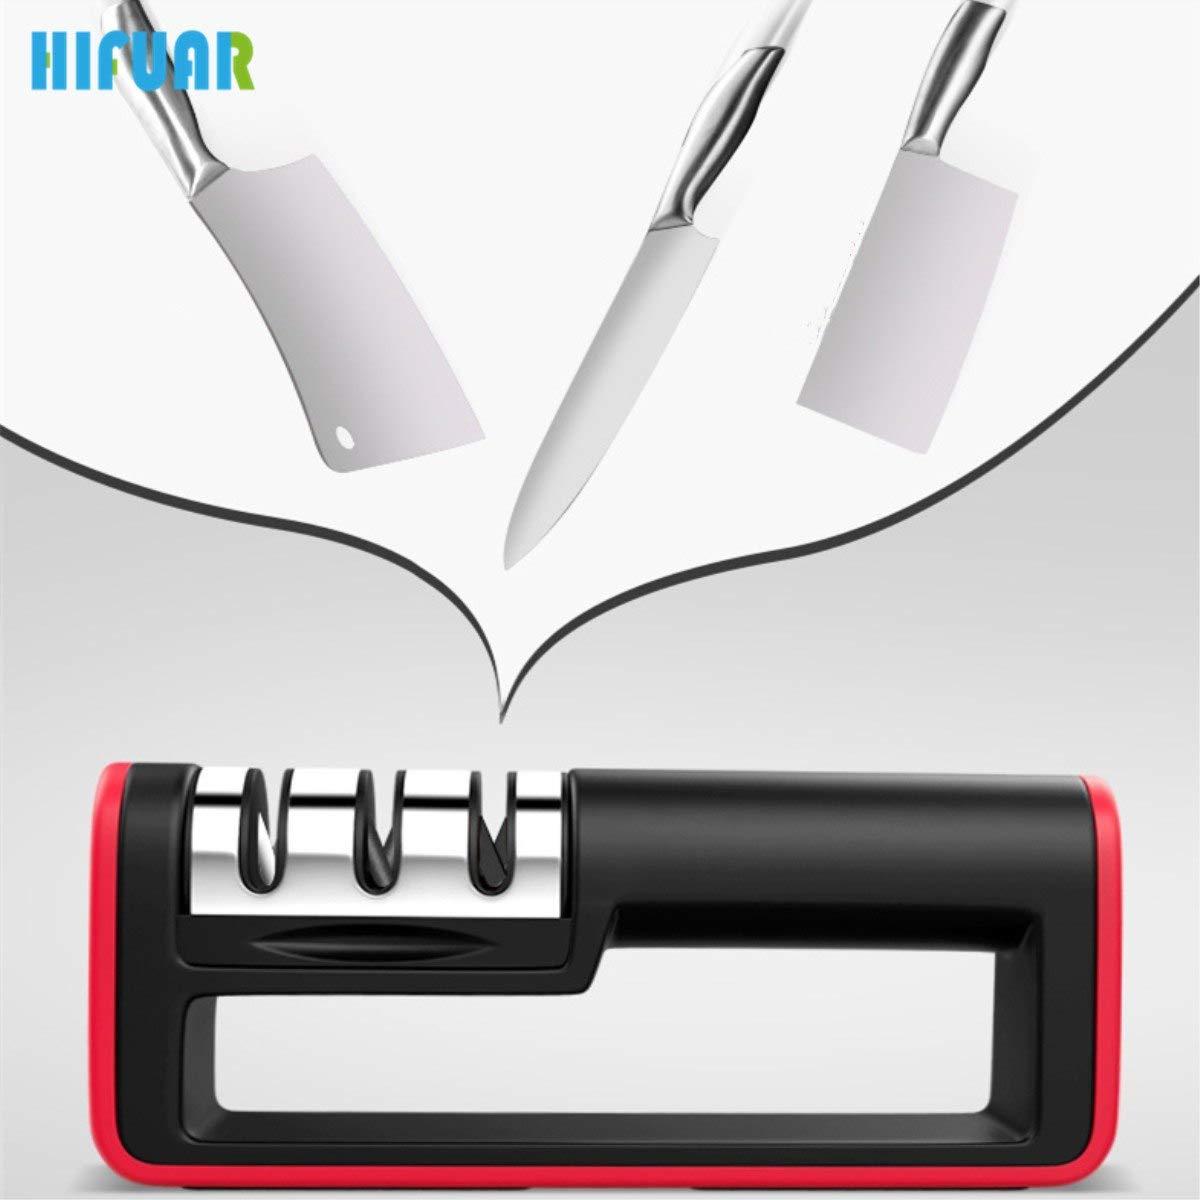 Amazon.com: Hifuar cuchillo afilador de 3 etapas afilador de ...